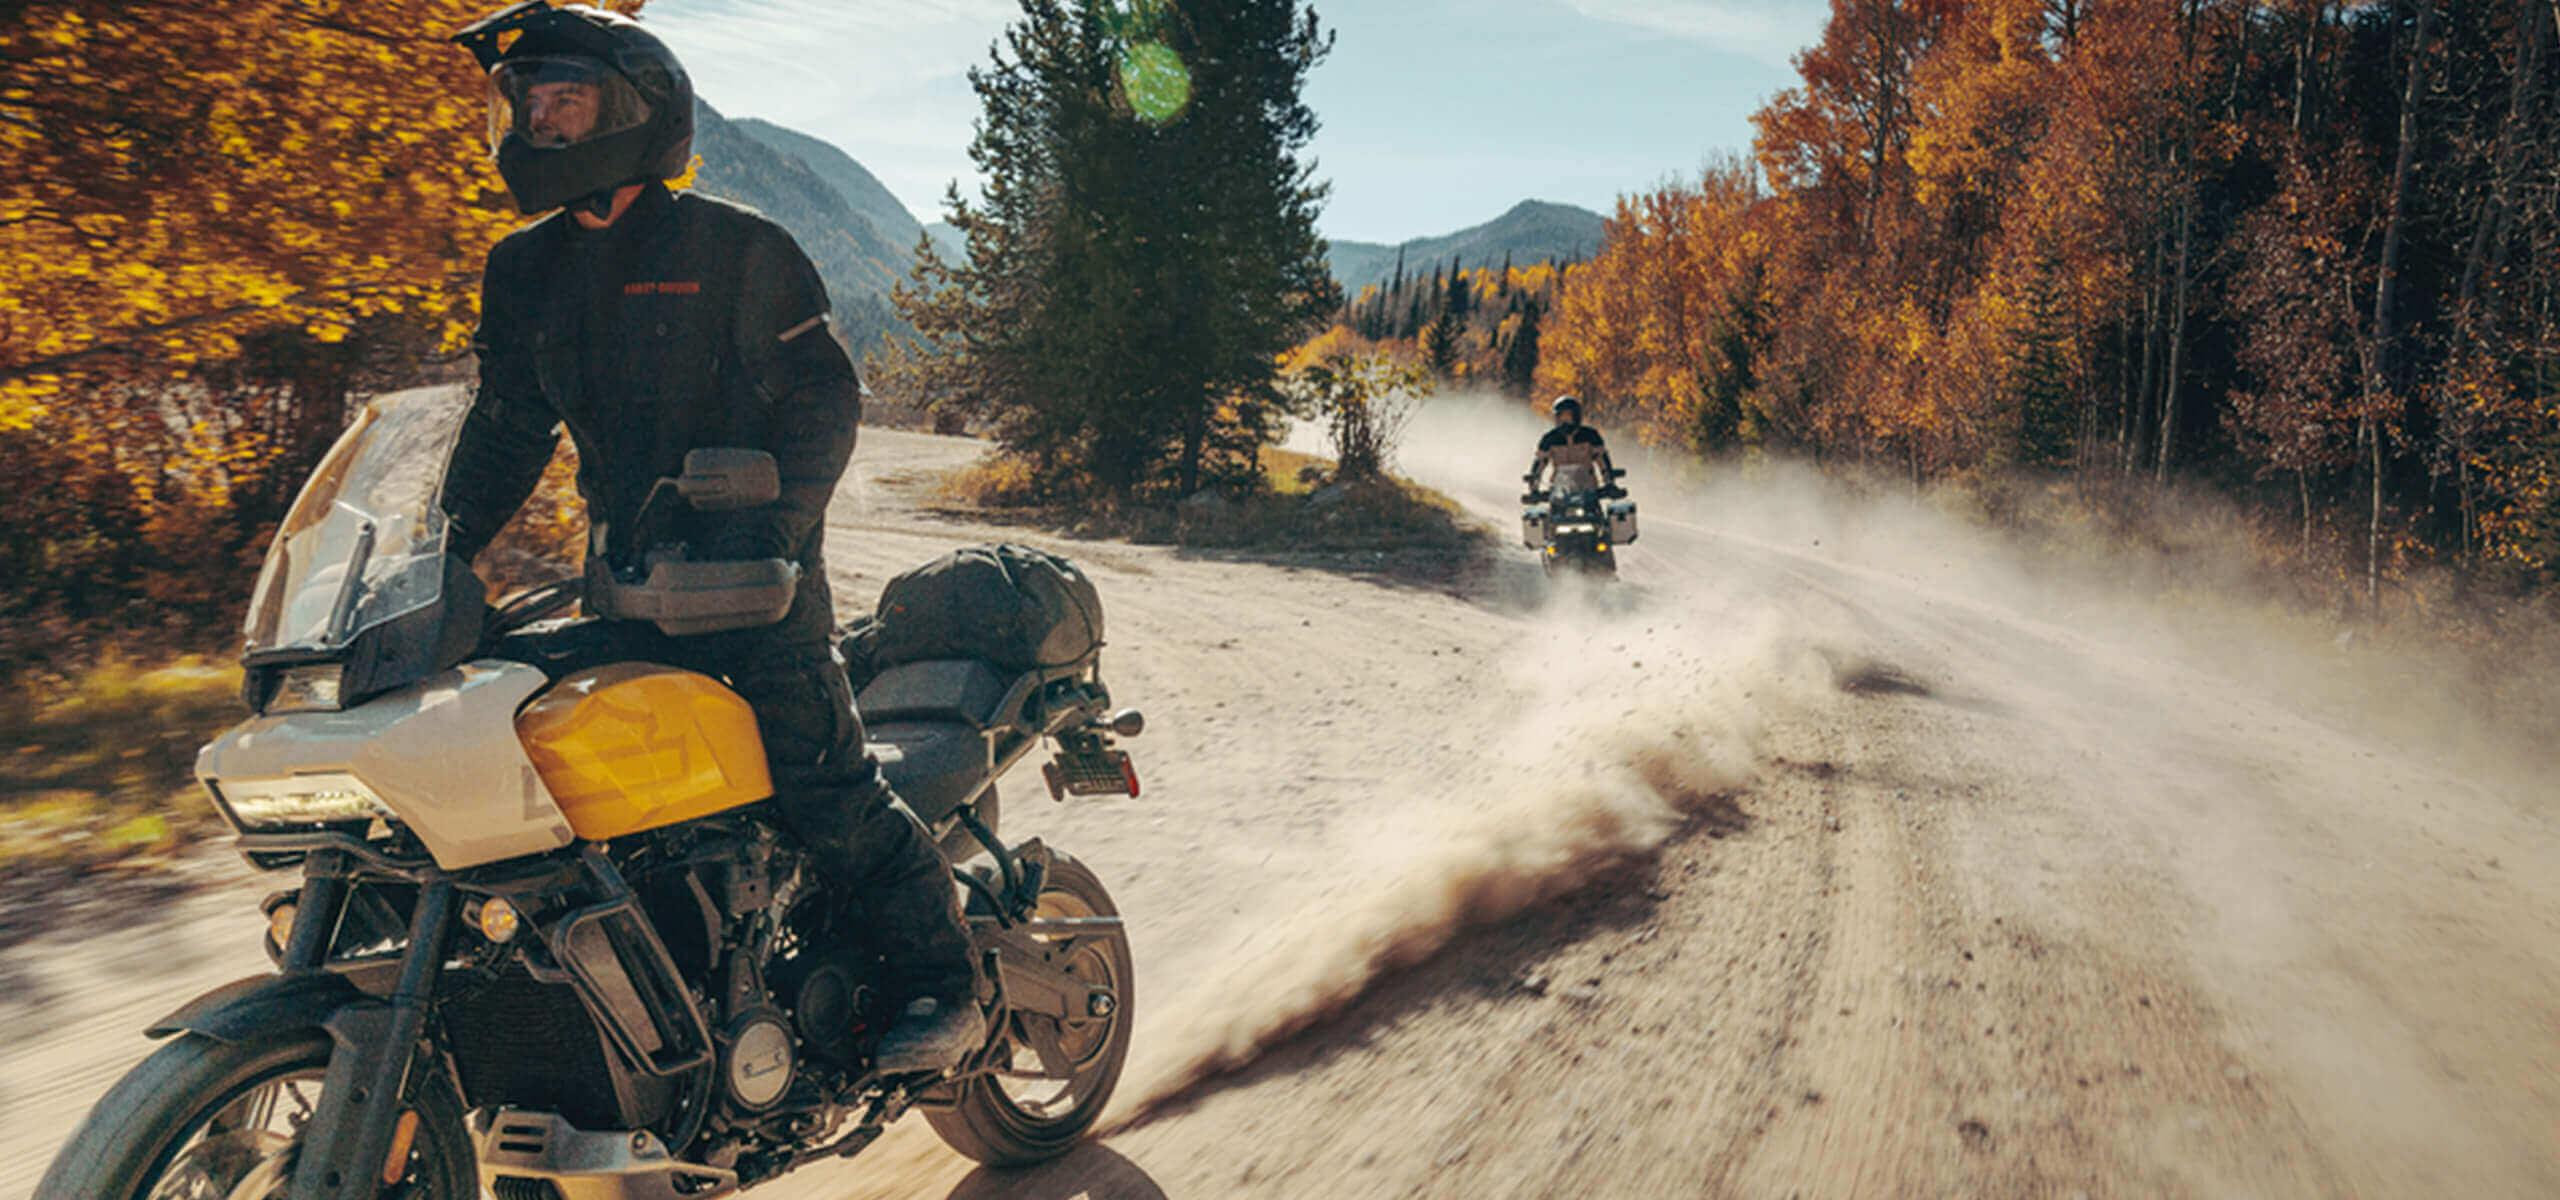 New Ducati & Harley-Davidson Motorcycles | Riders Motorcycles